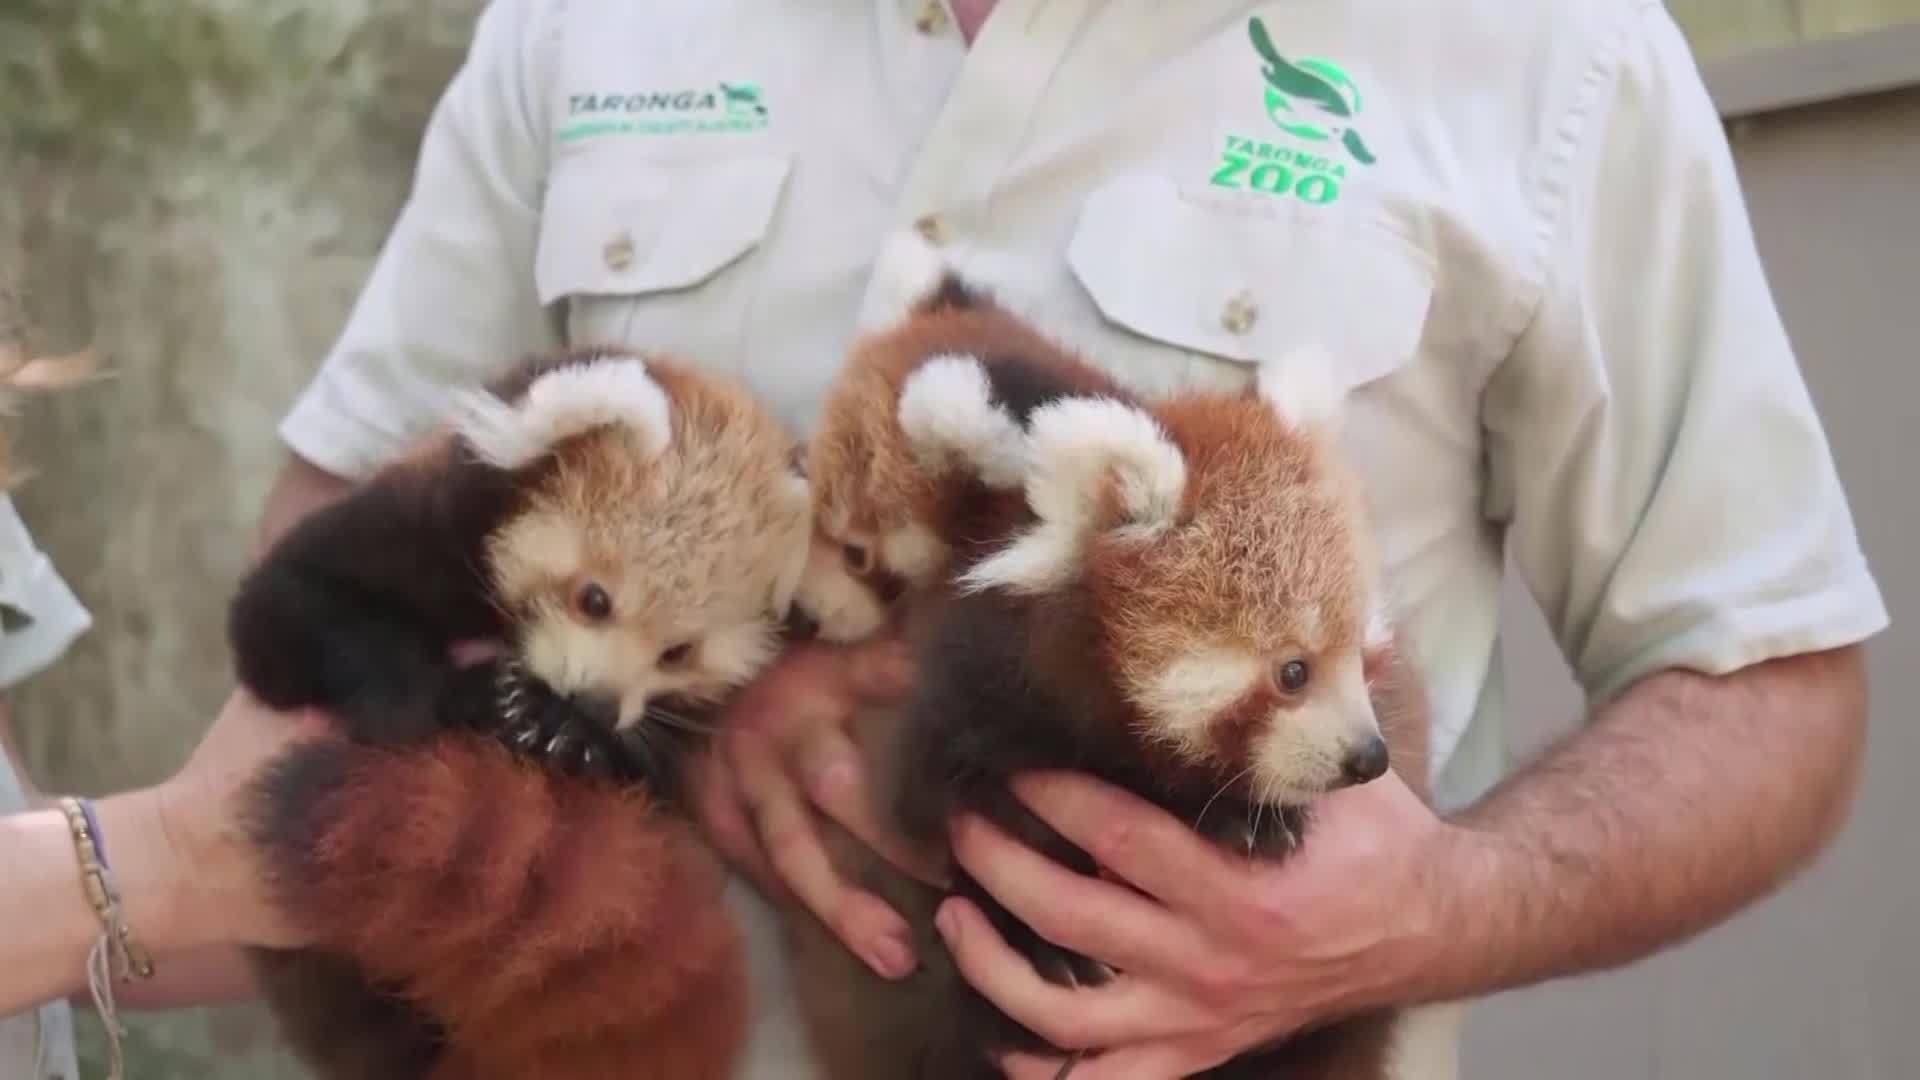 3_Red_Panda_Cubs_Born_in_Australian_Zoo__3_20190310164141